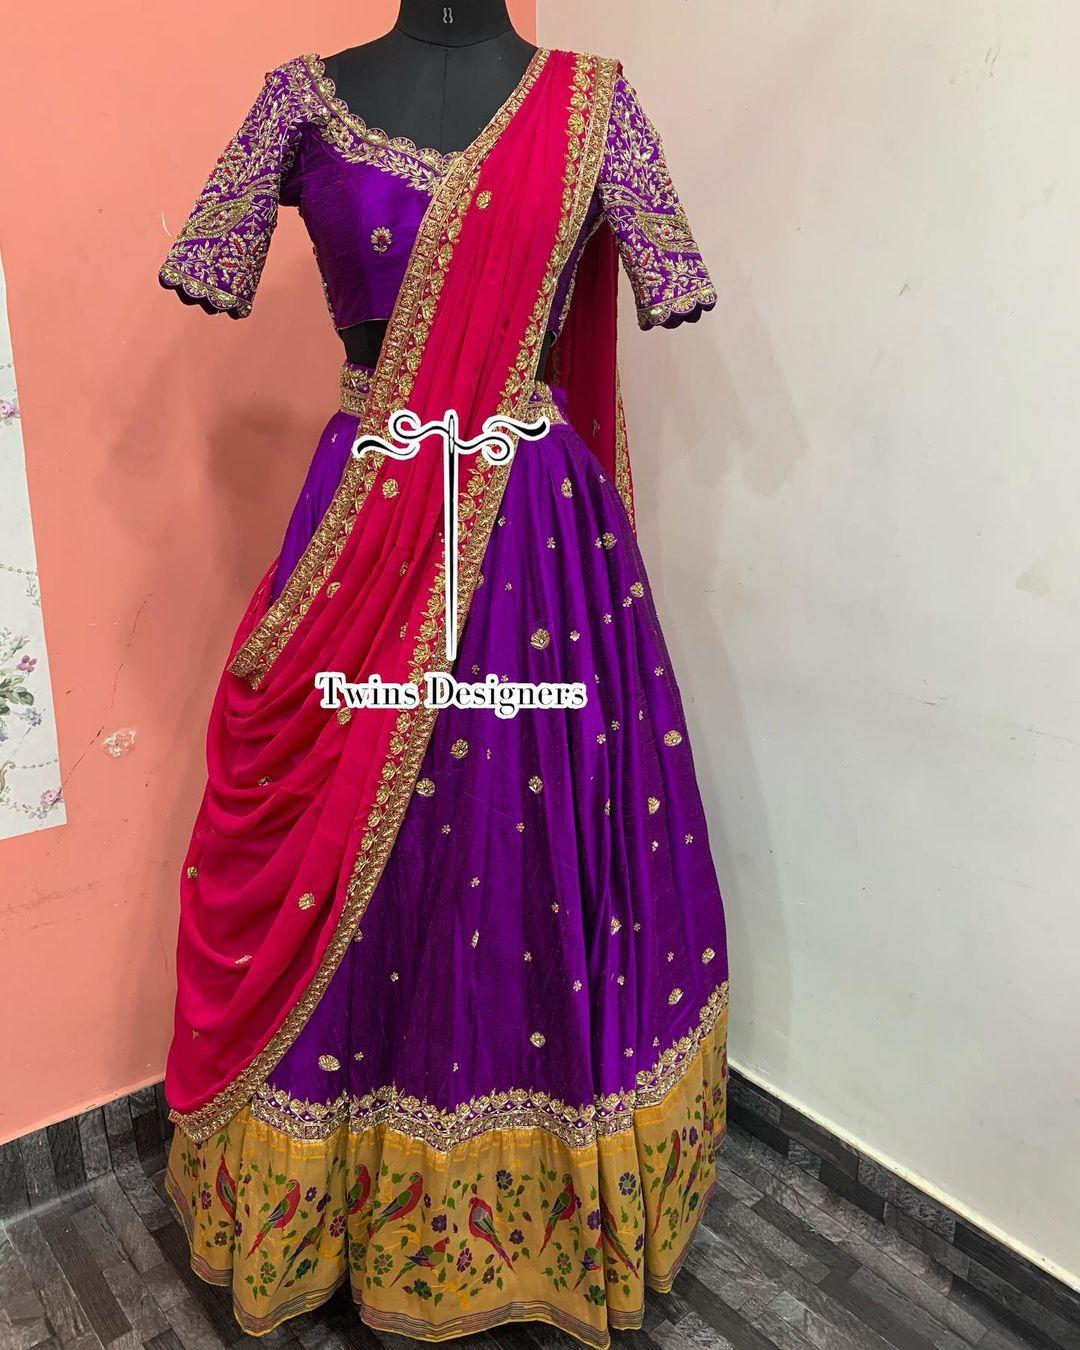 Gorgeous purple color bridal lehenga set. Bridal lehenga with parrots paithani boarder. blouse with hand embroidery work.  2021-05-27